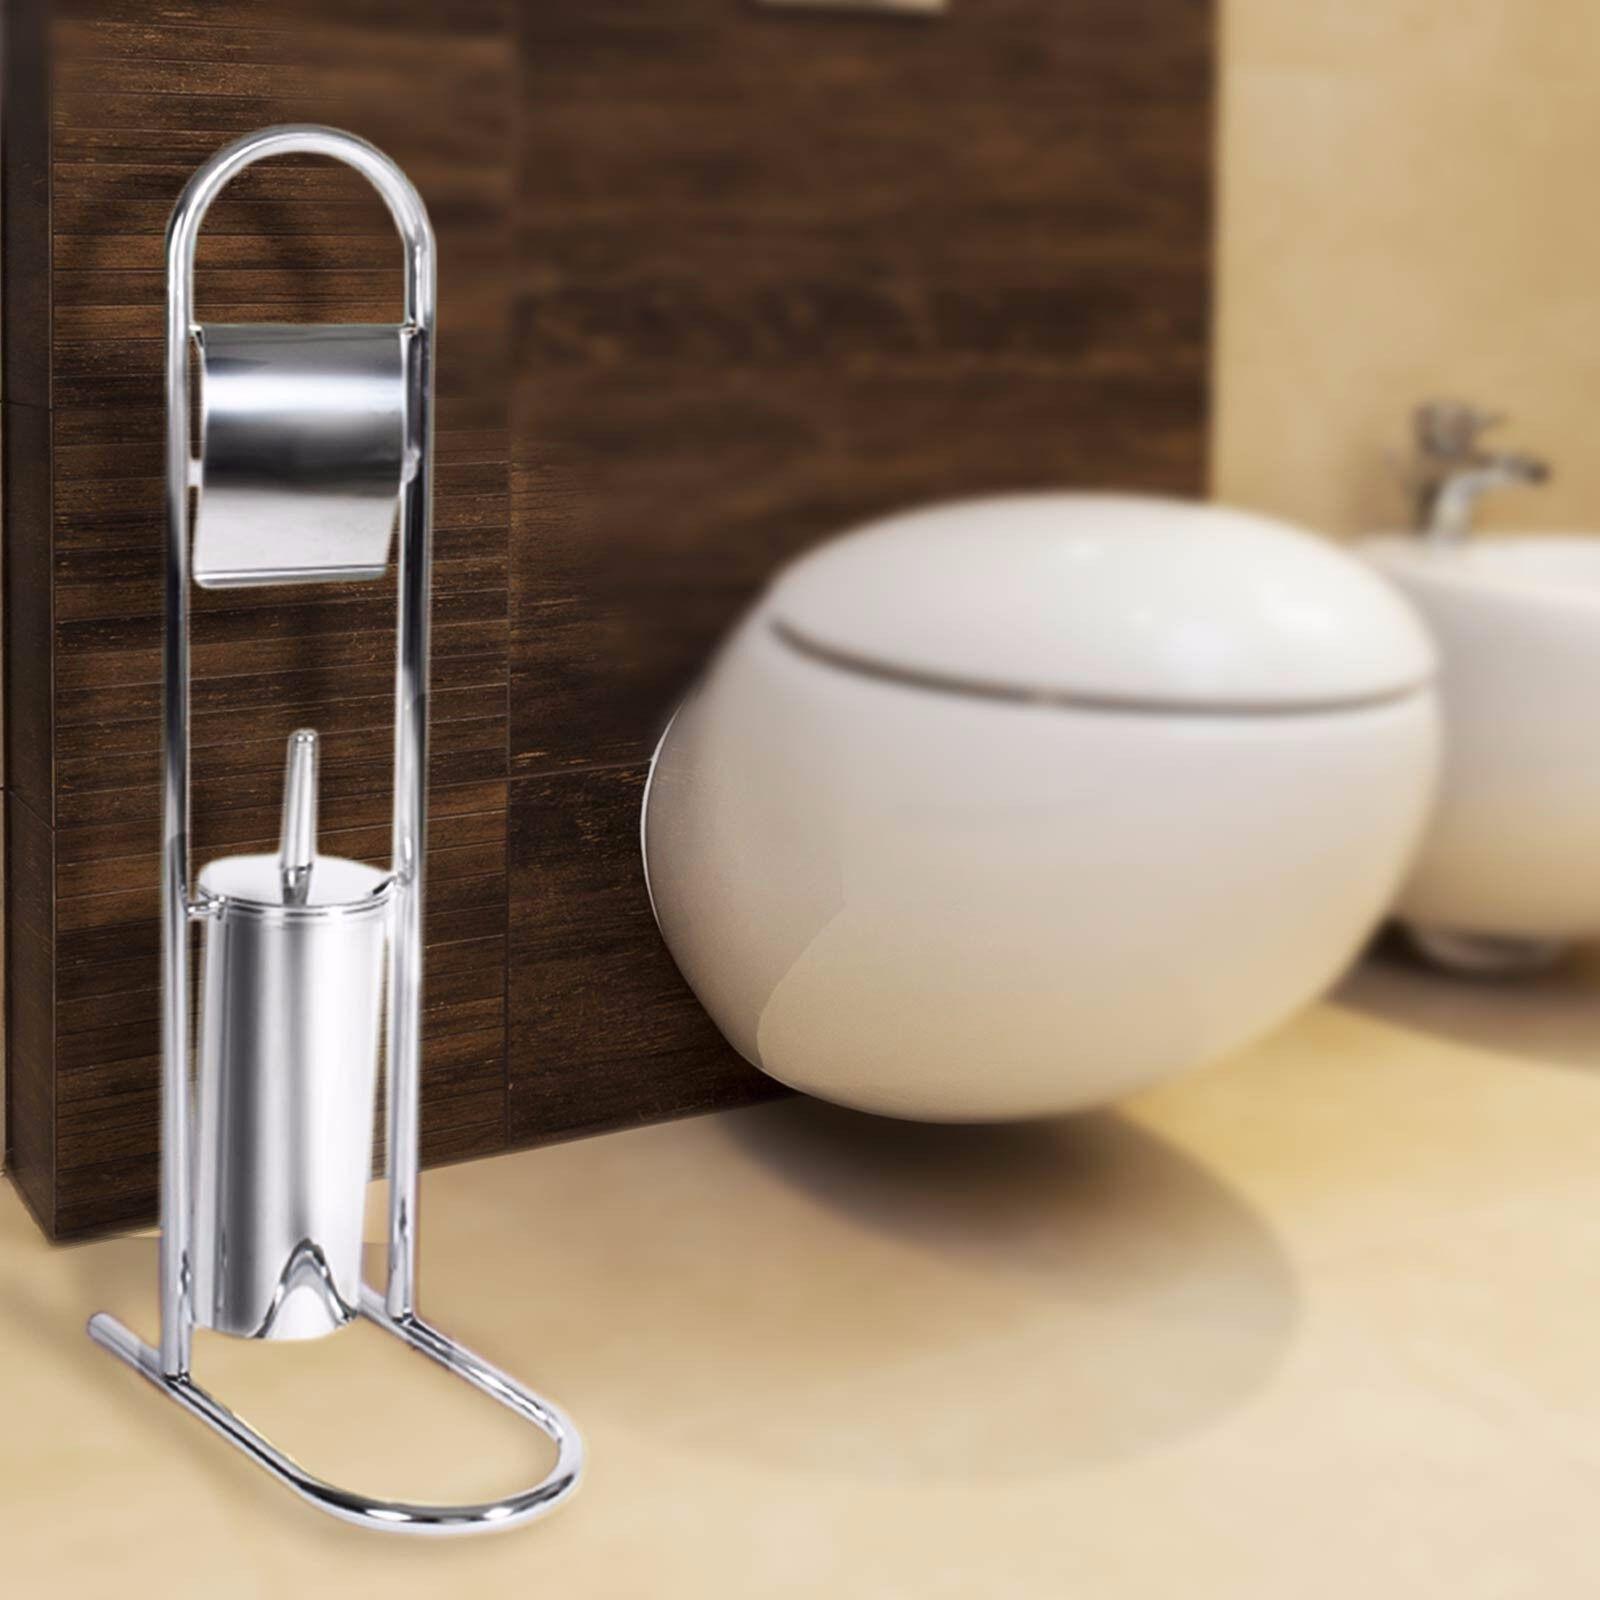 WC-Garnitur Priola   Toilettenpapier- & Bürstenhalter   BxTxH  16x27x71 cm